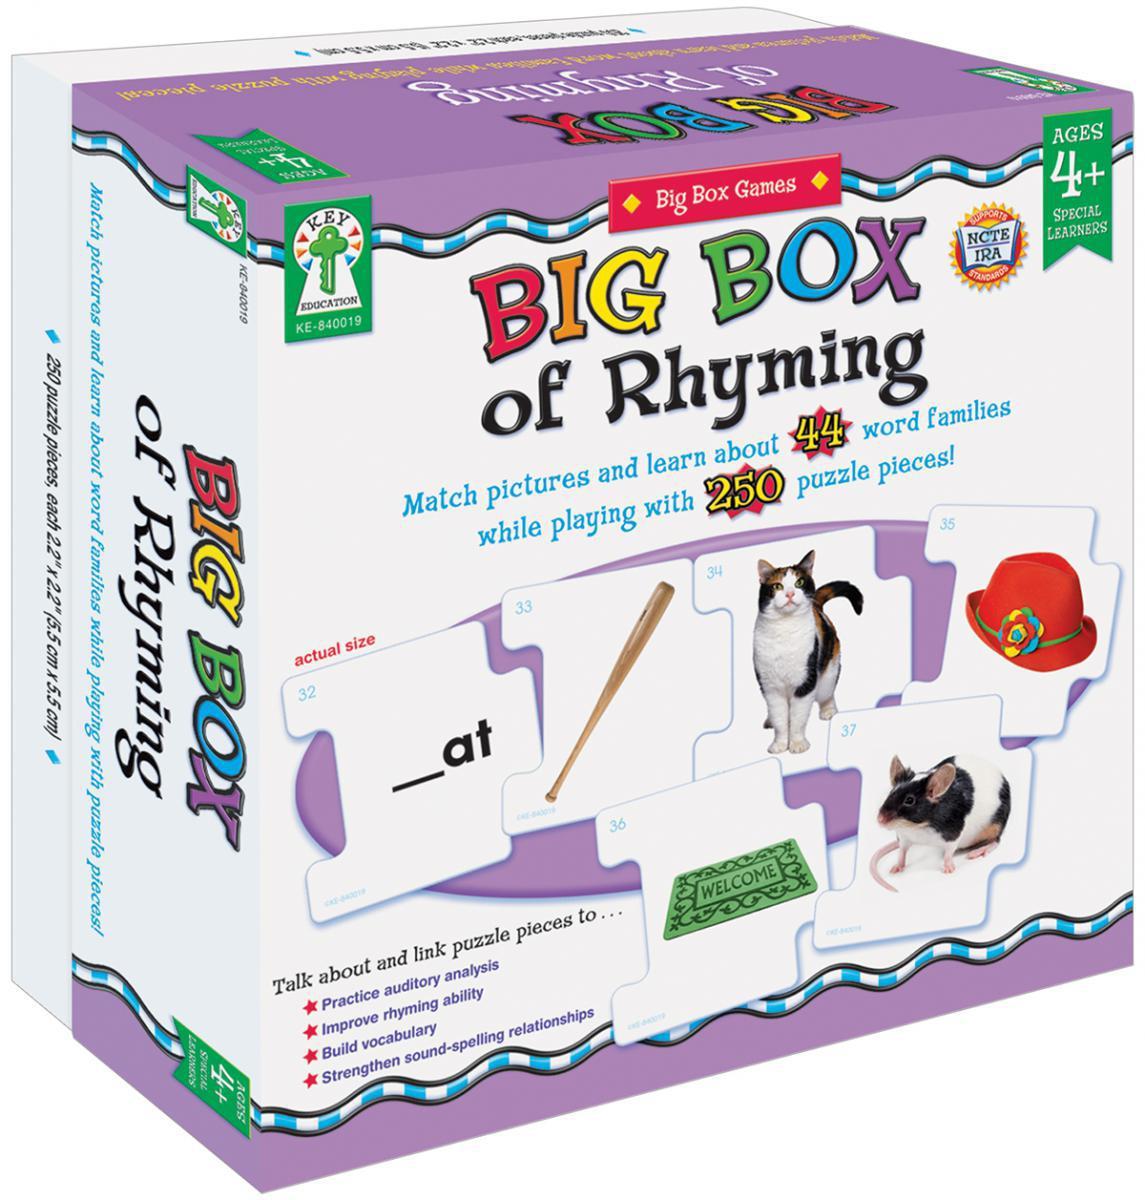 Big Box of Rhyming